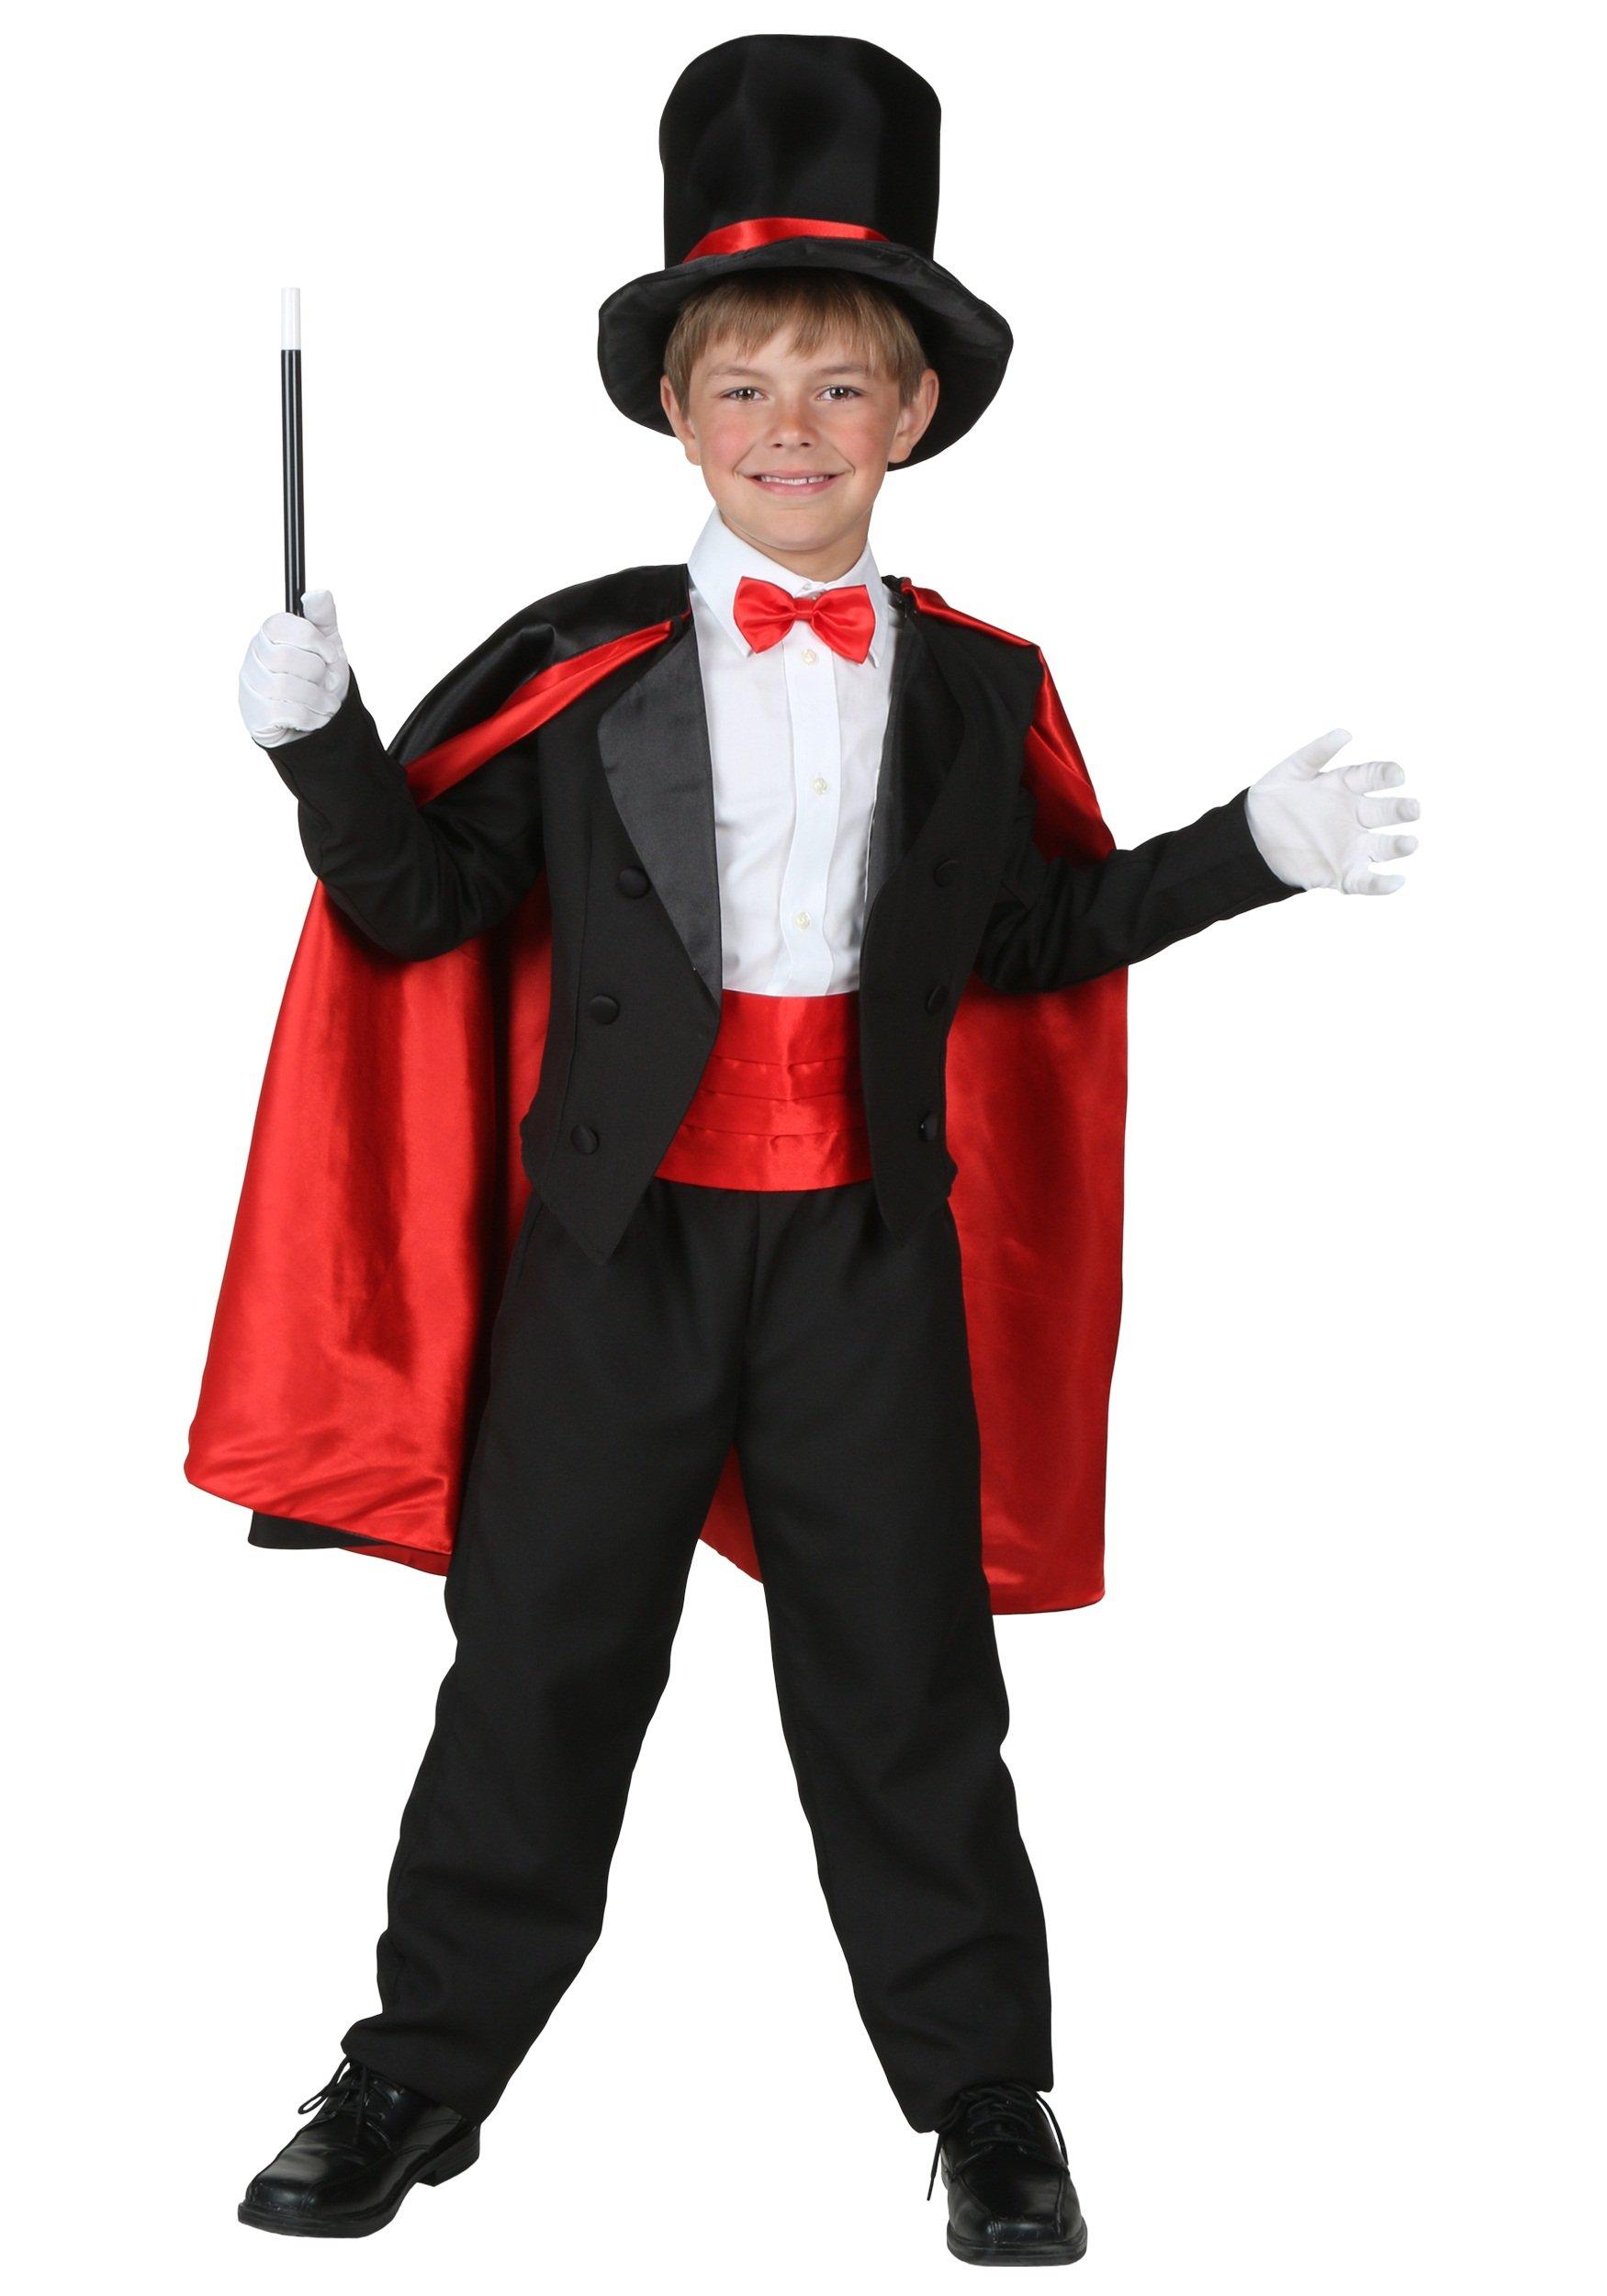 Child Magician Costume Large